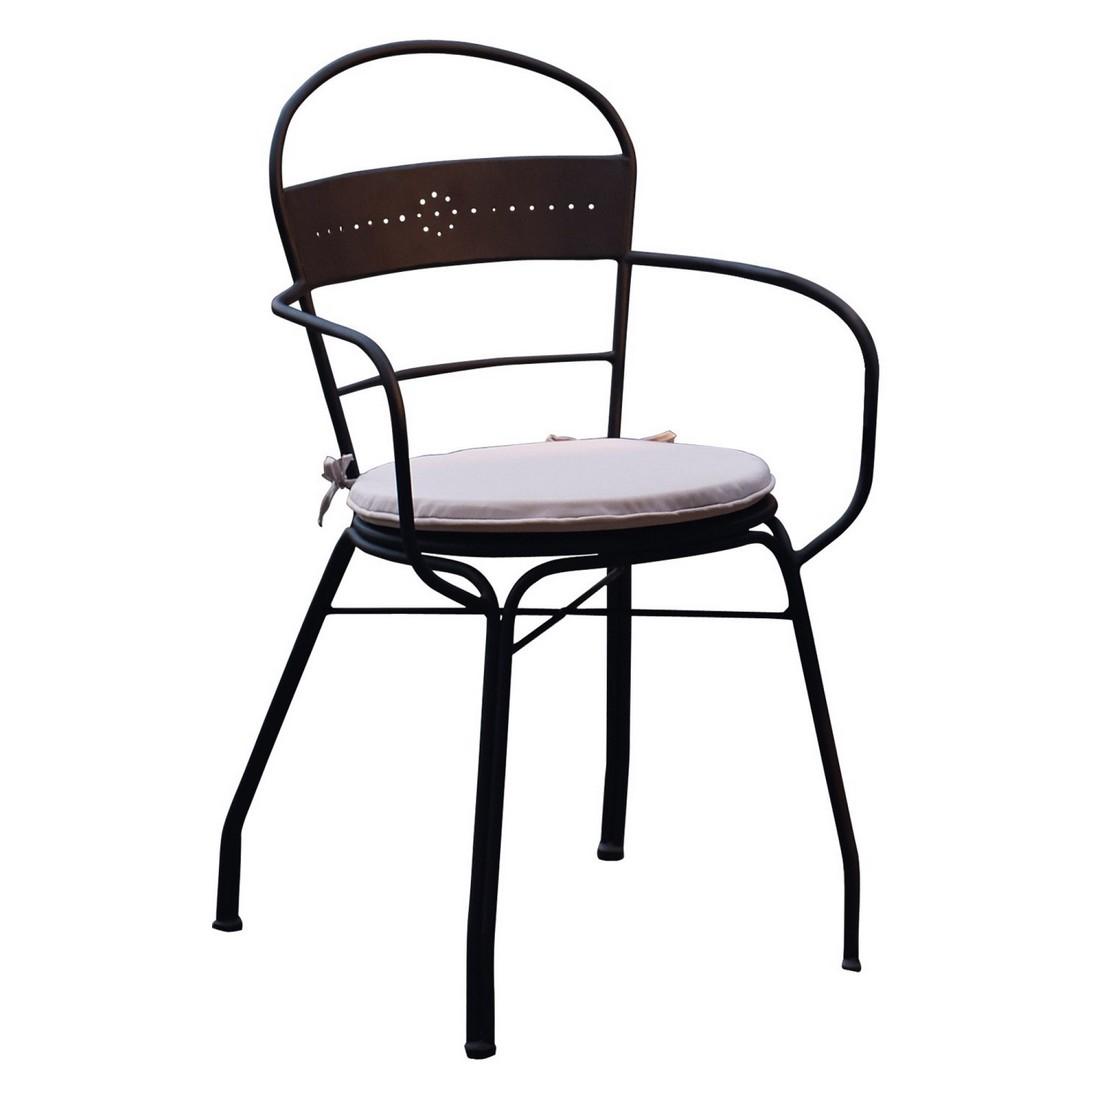 Loberon Stuhl Othon - Eisen schwarz, Loberon